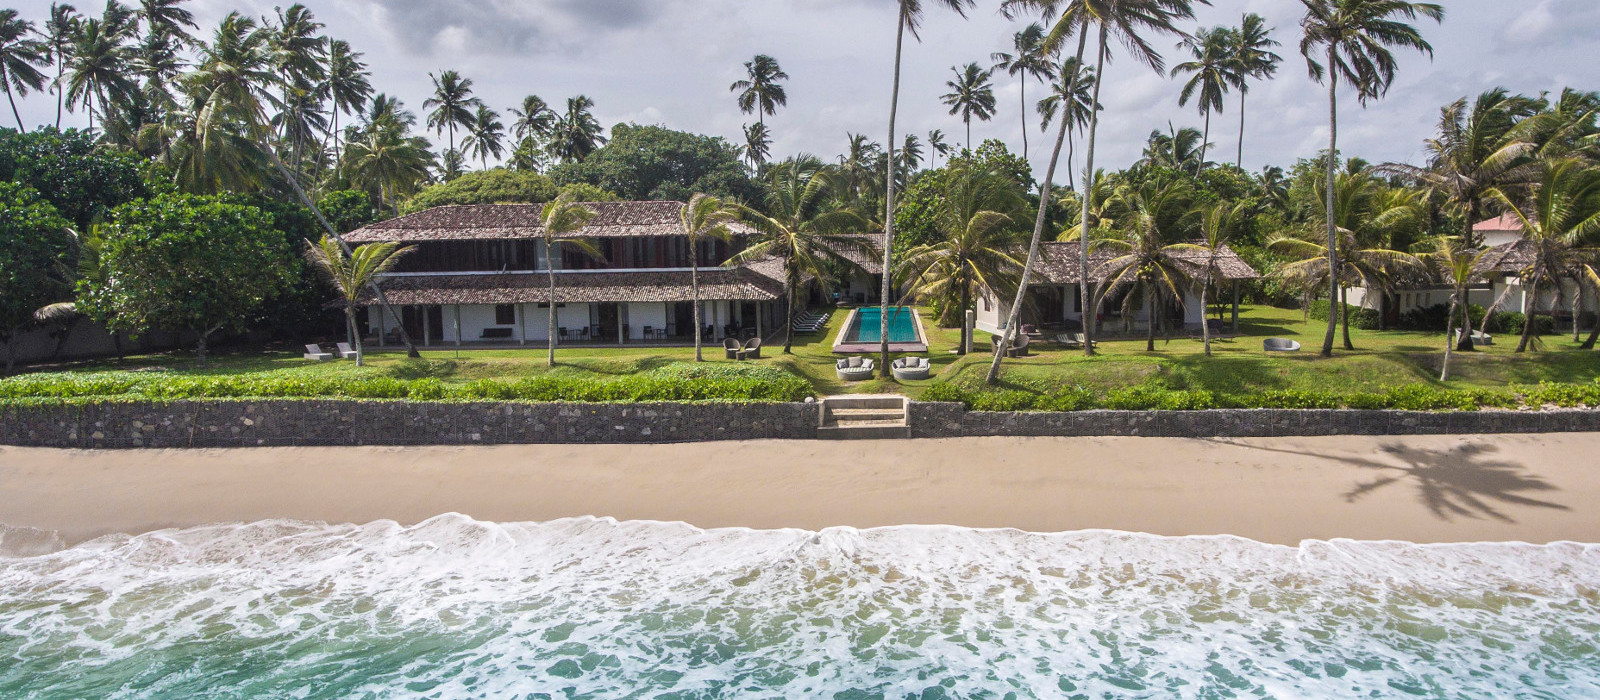 Hotel Thalpe, The Firangipani Tree Sri Lanka